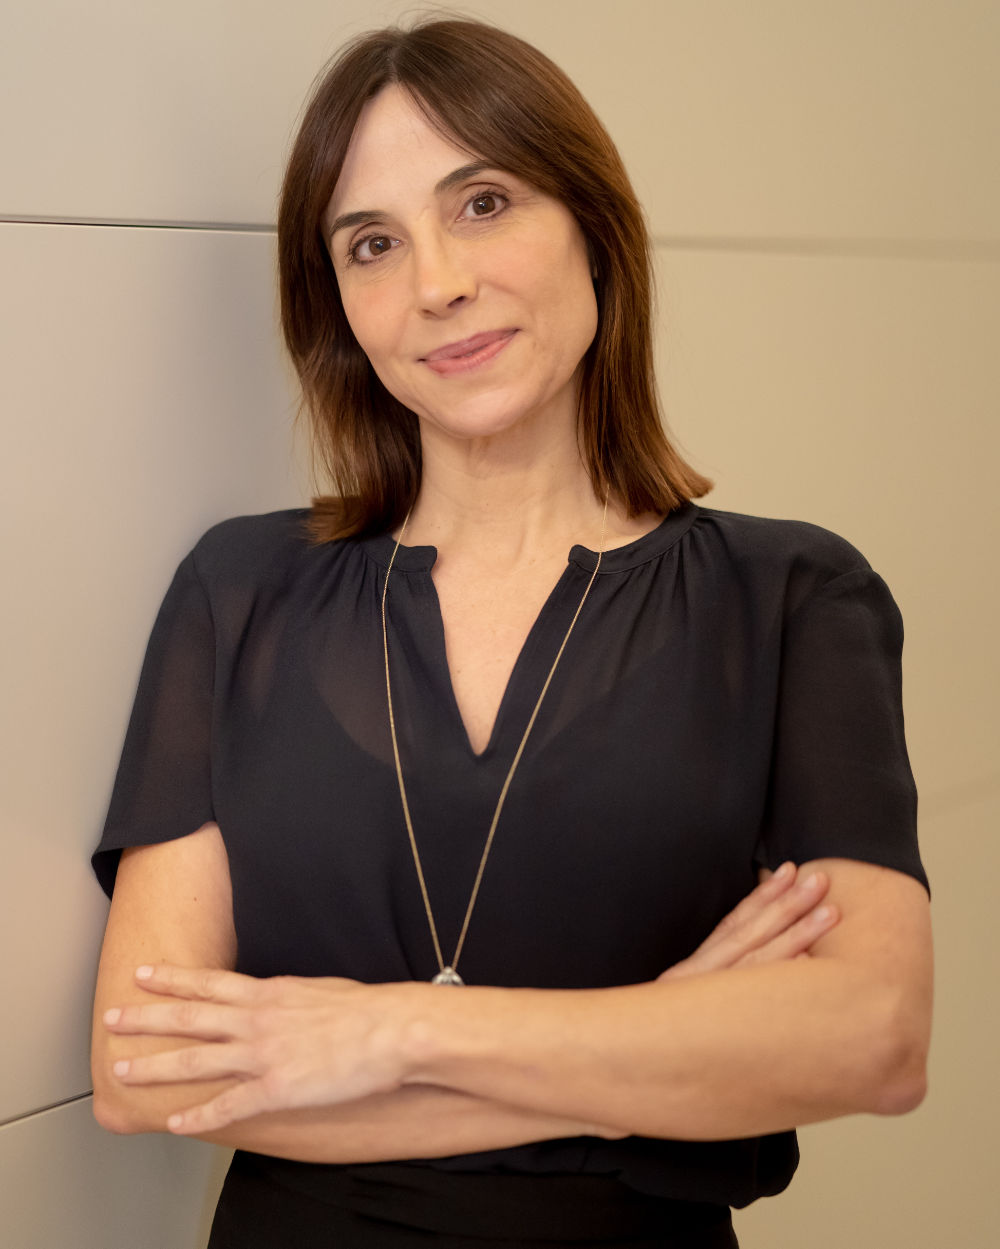 Yvette Pons